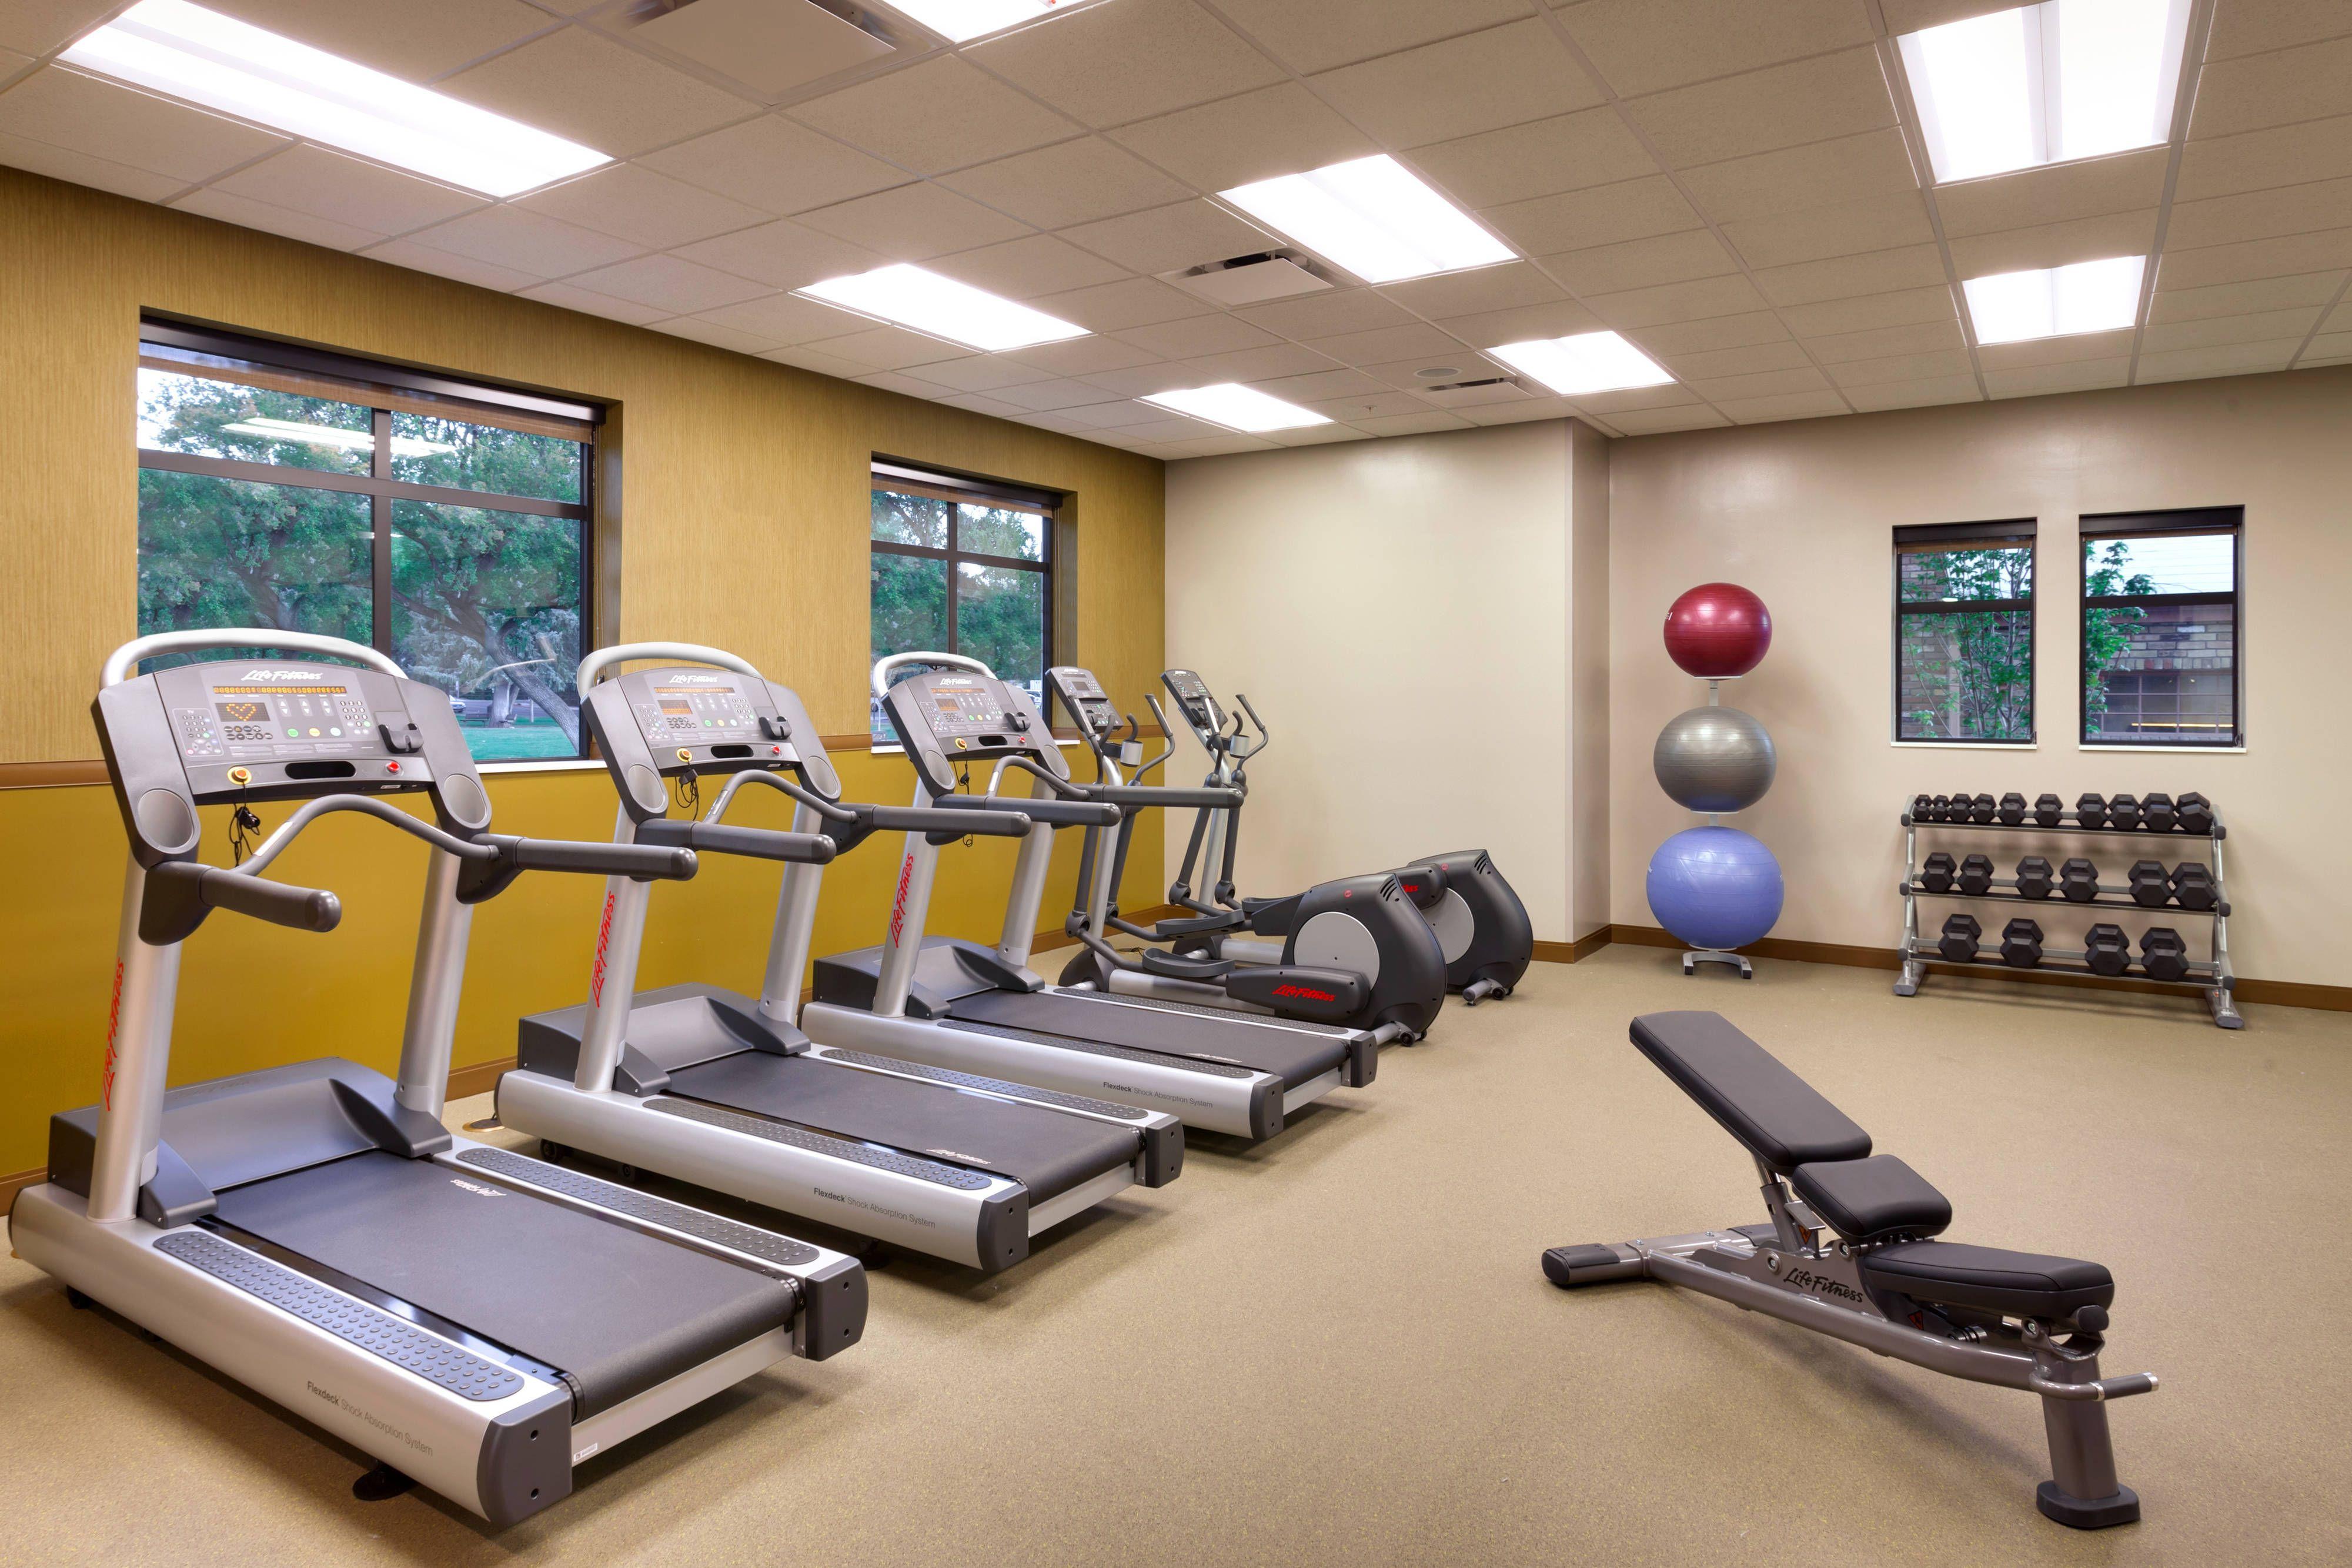 Residence Inn Flagstaff Fitness Center Relax Beautiful Memorable Home Decor Residences Home